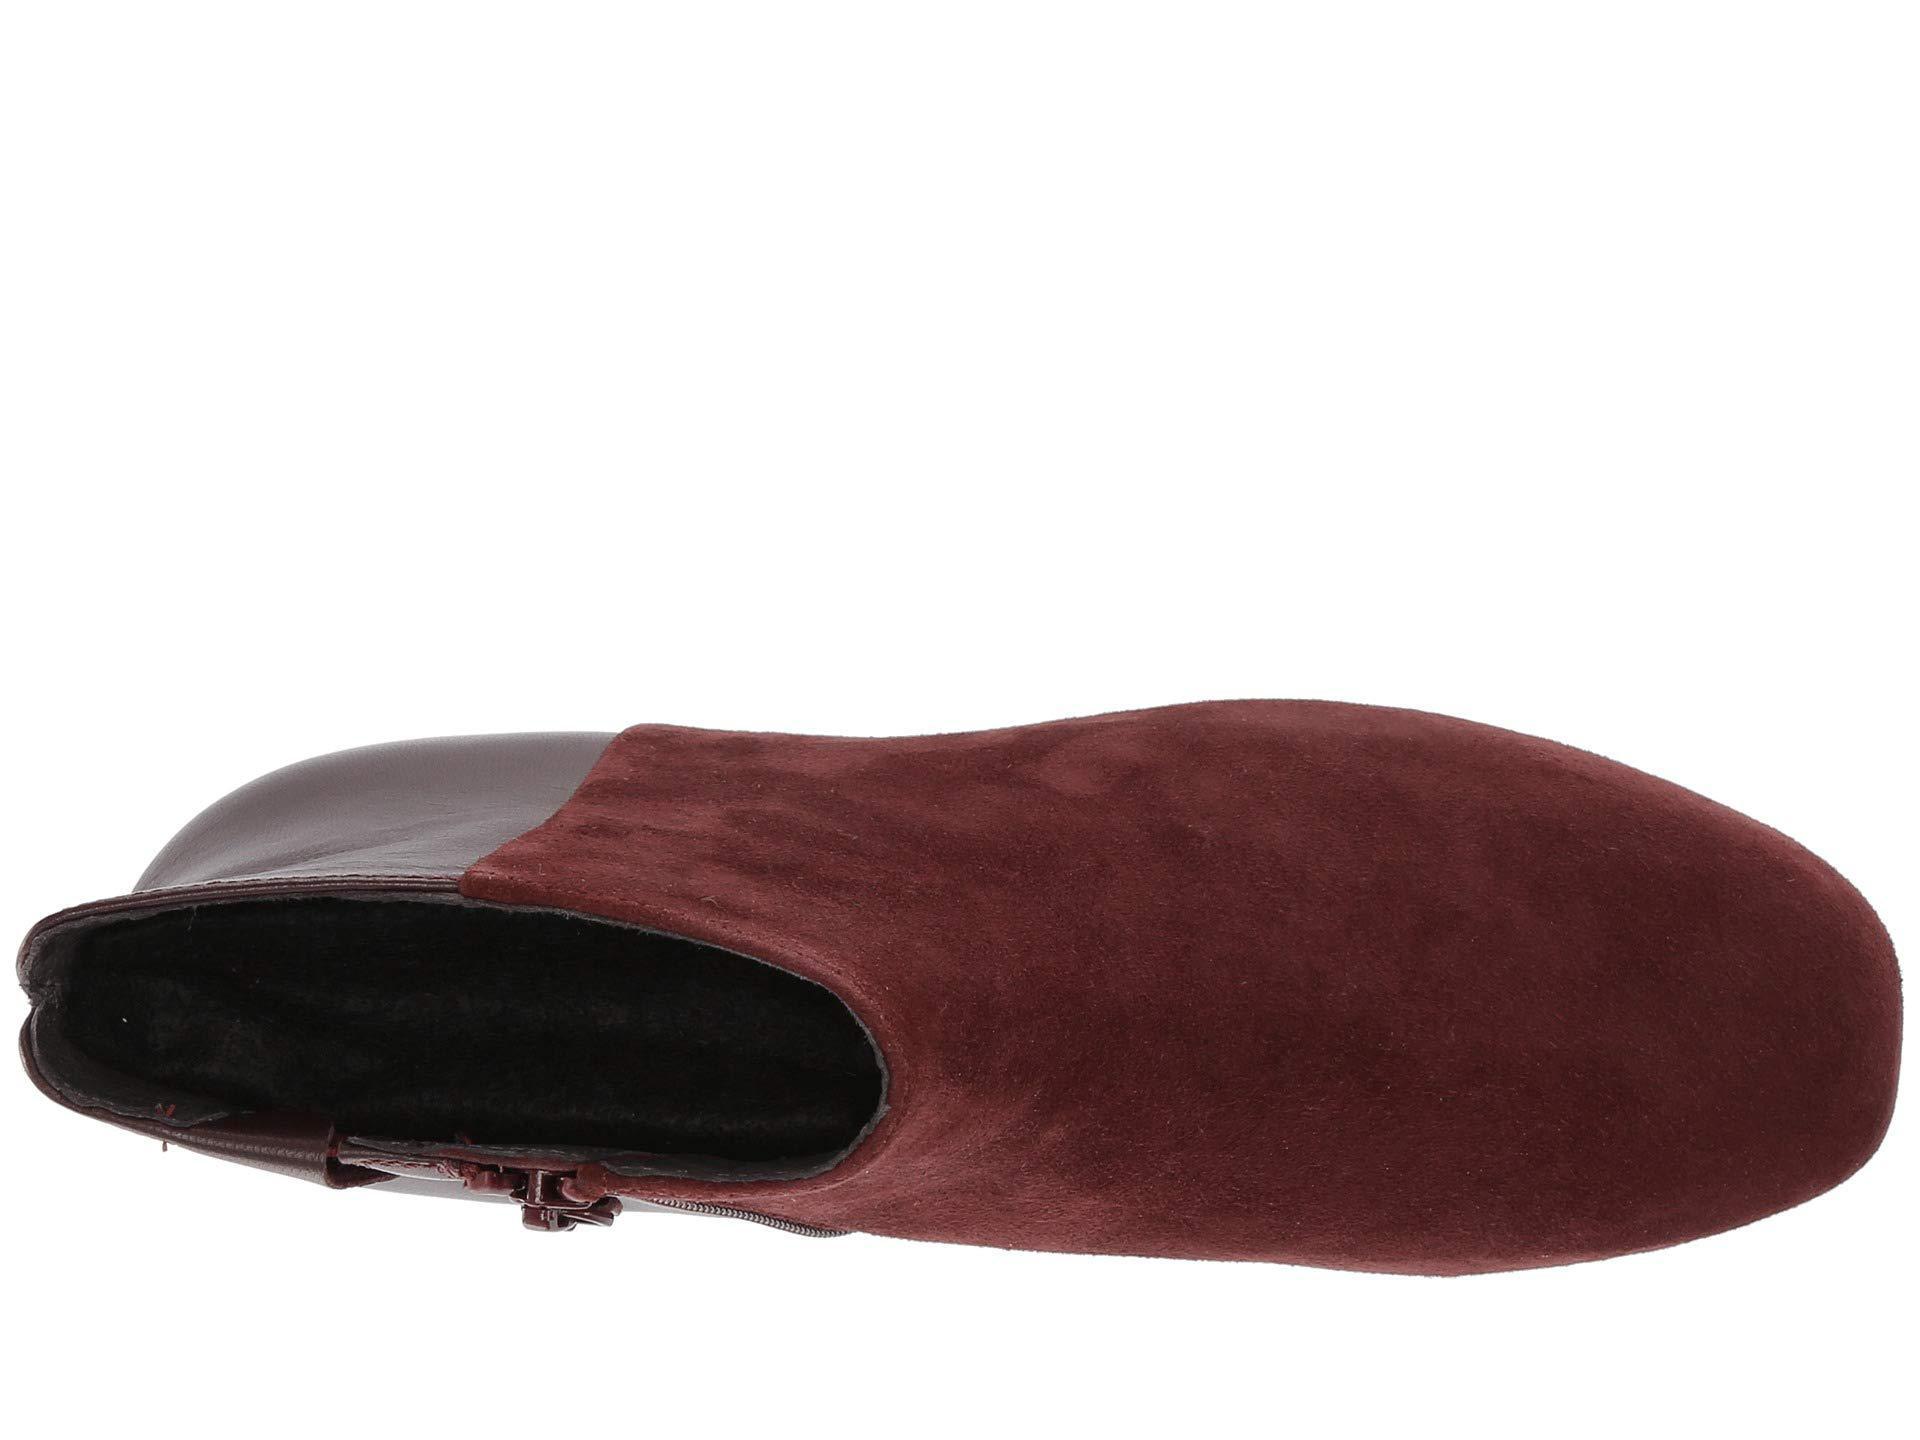 85c37b45e3c5b2 K400314 Serena Camper Shoes Women s burgundy Lyst 4YRvxwax ...